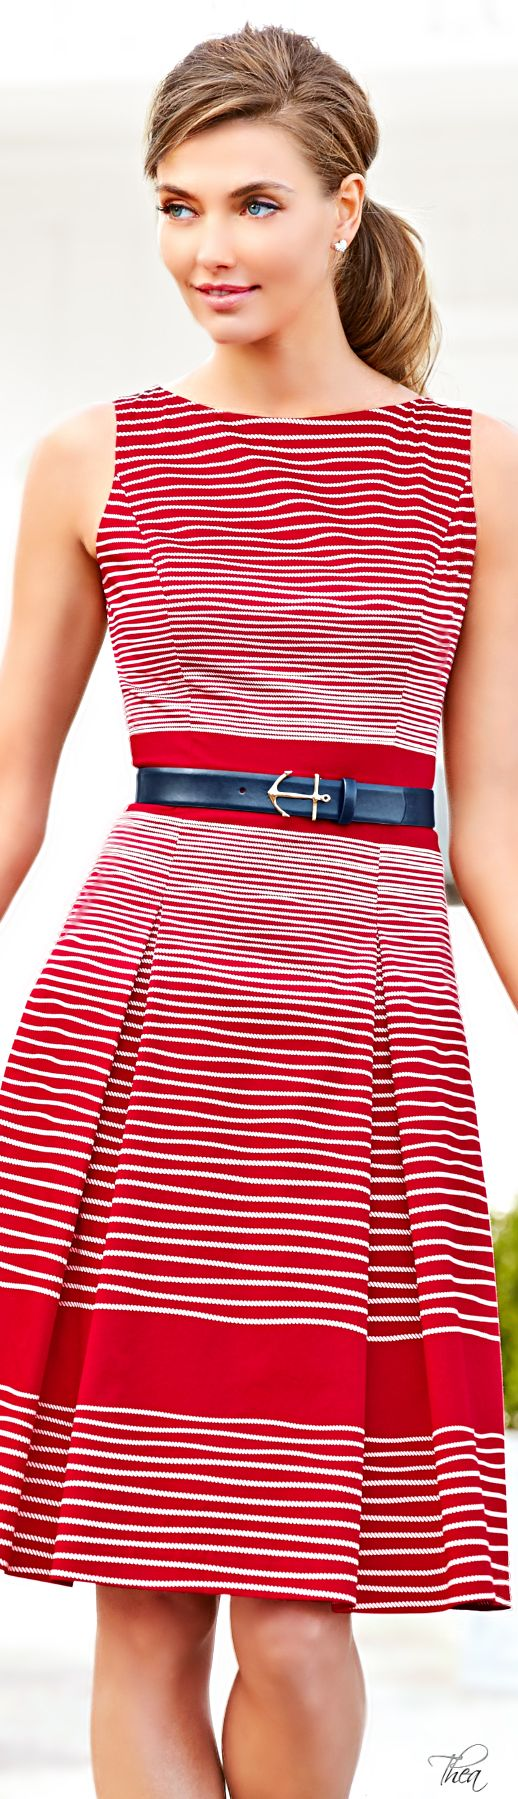 Cute dress | Ireni Rodrigues | Pinterest | Rojo, Azul y Vestiditos